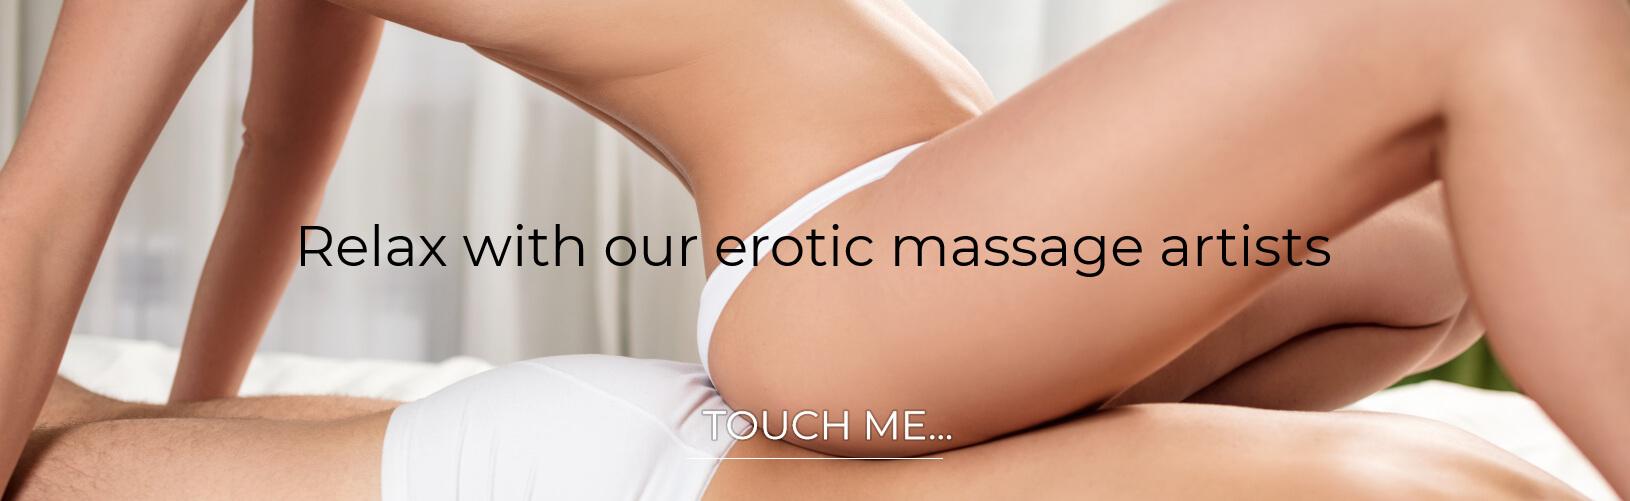 Erotic massage Brisbane Melbourne Sydney Canberra Adelaide